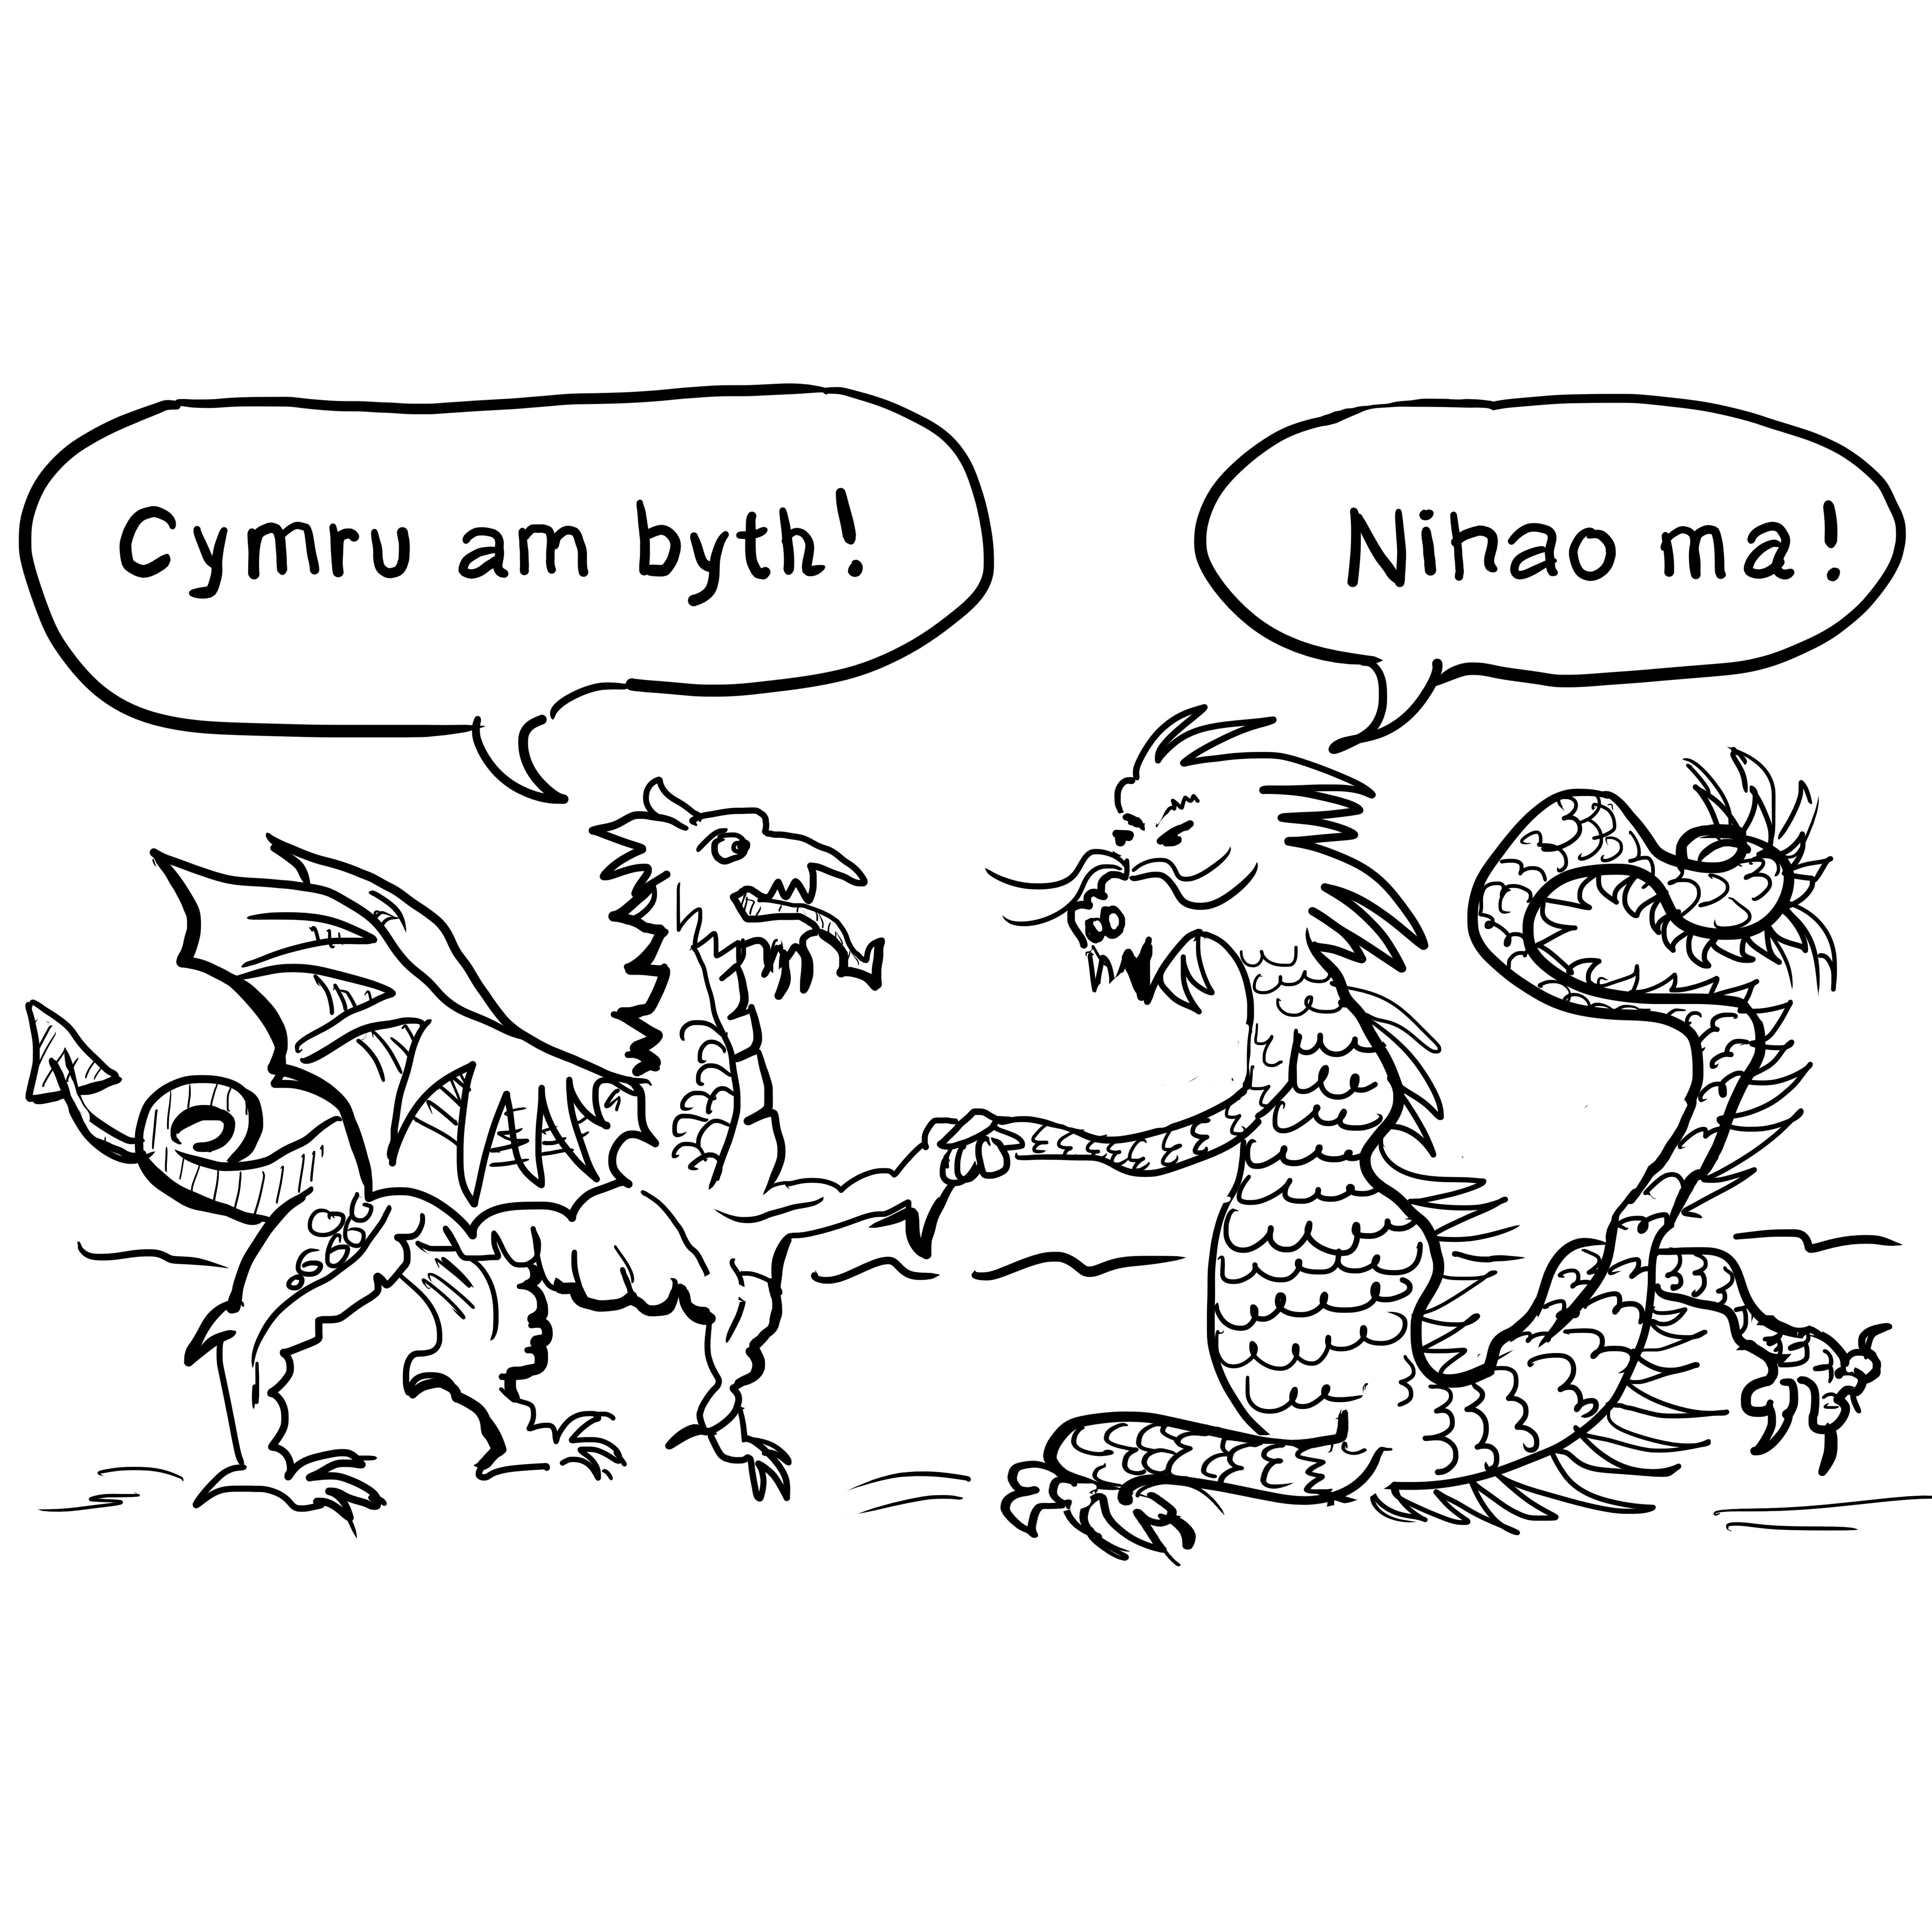 Dragons unite!